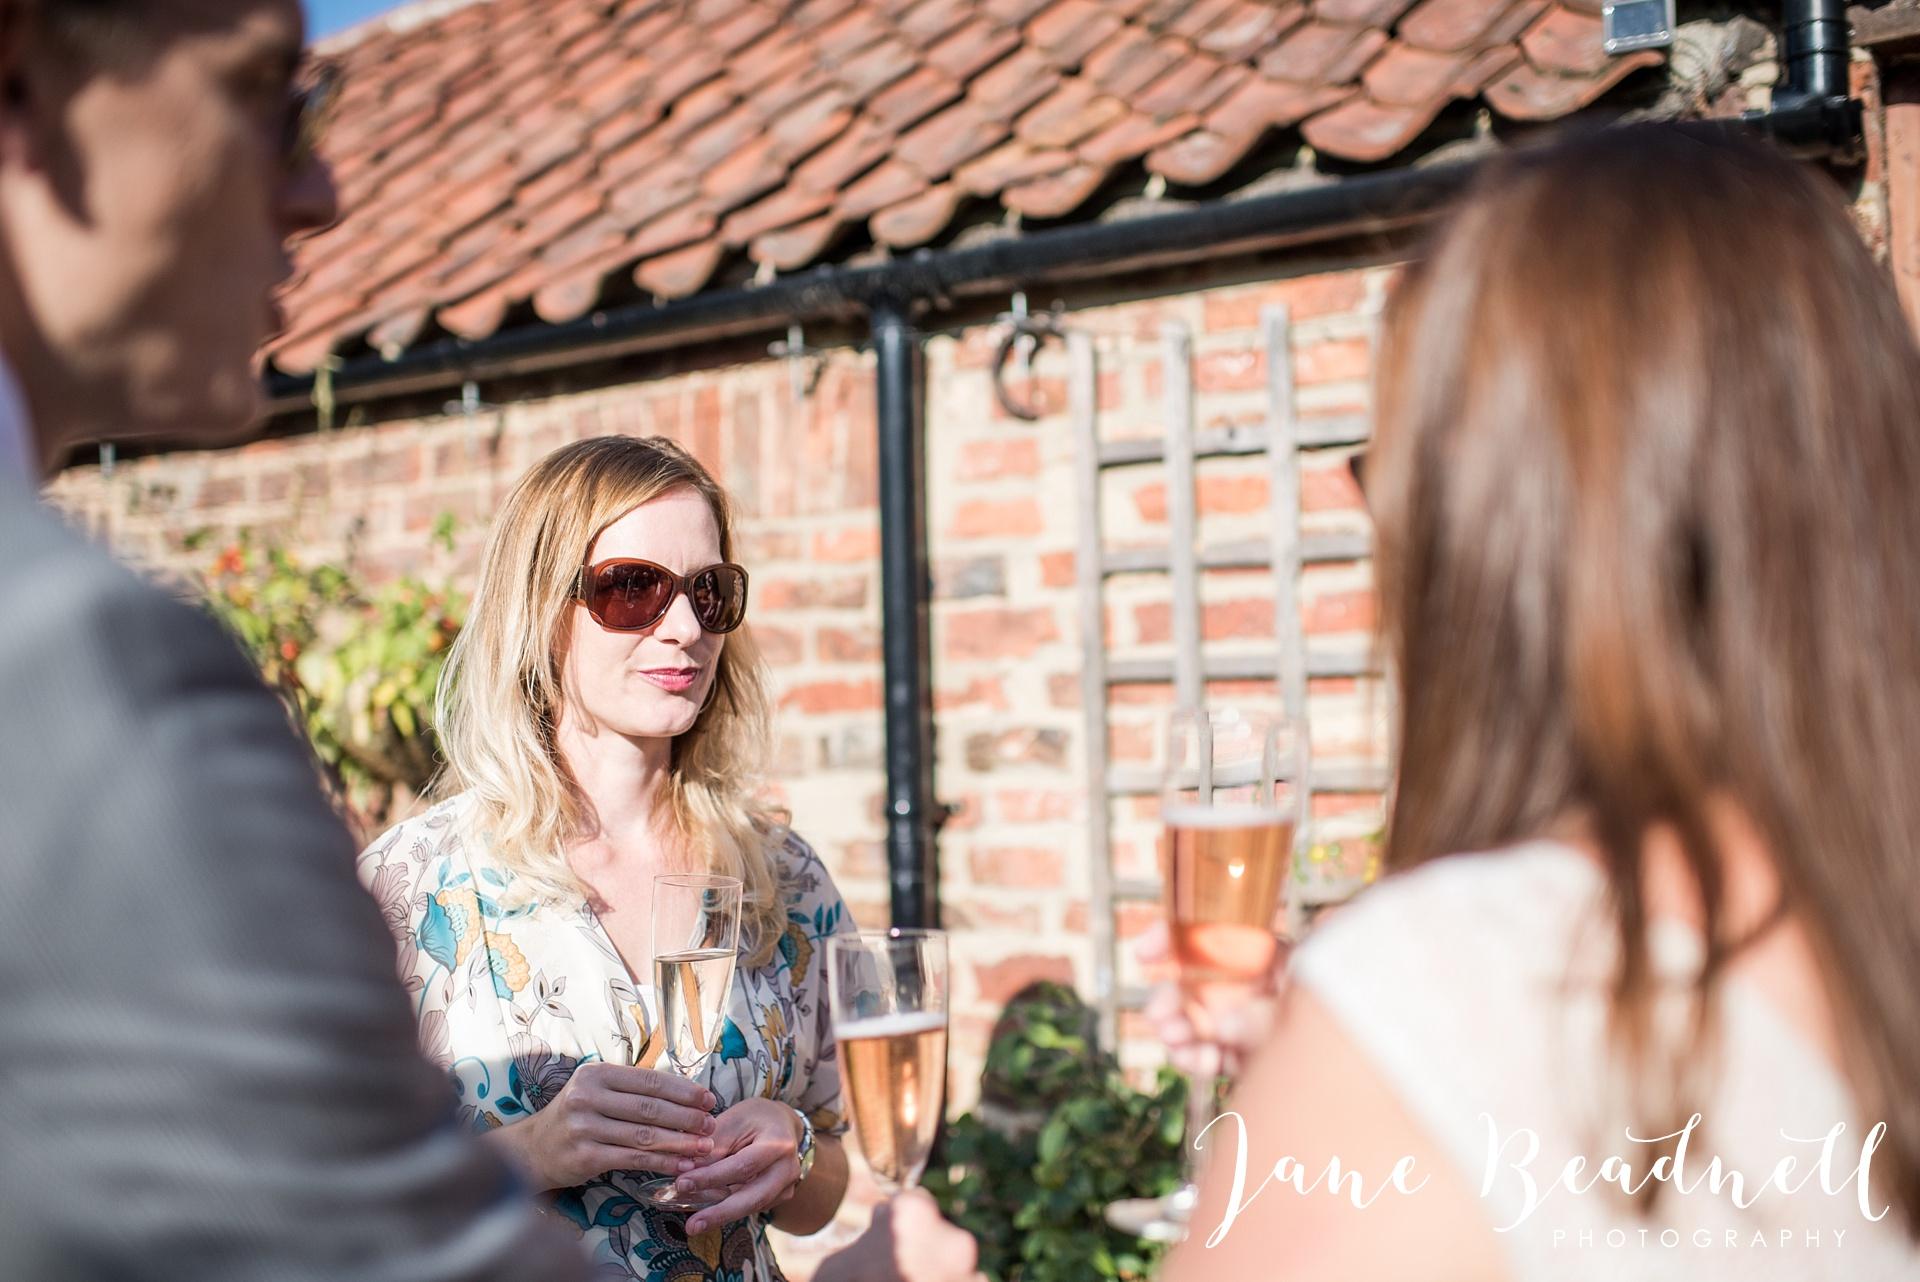 fine-art-wedding-photographer-jane-beadnell-yorkshire-wedding-photographer_0084